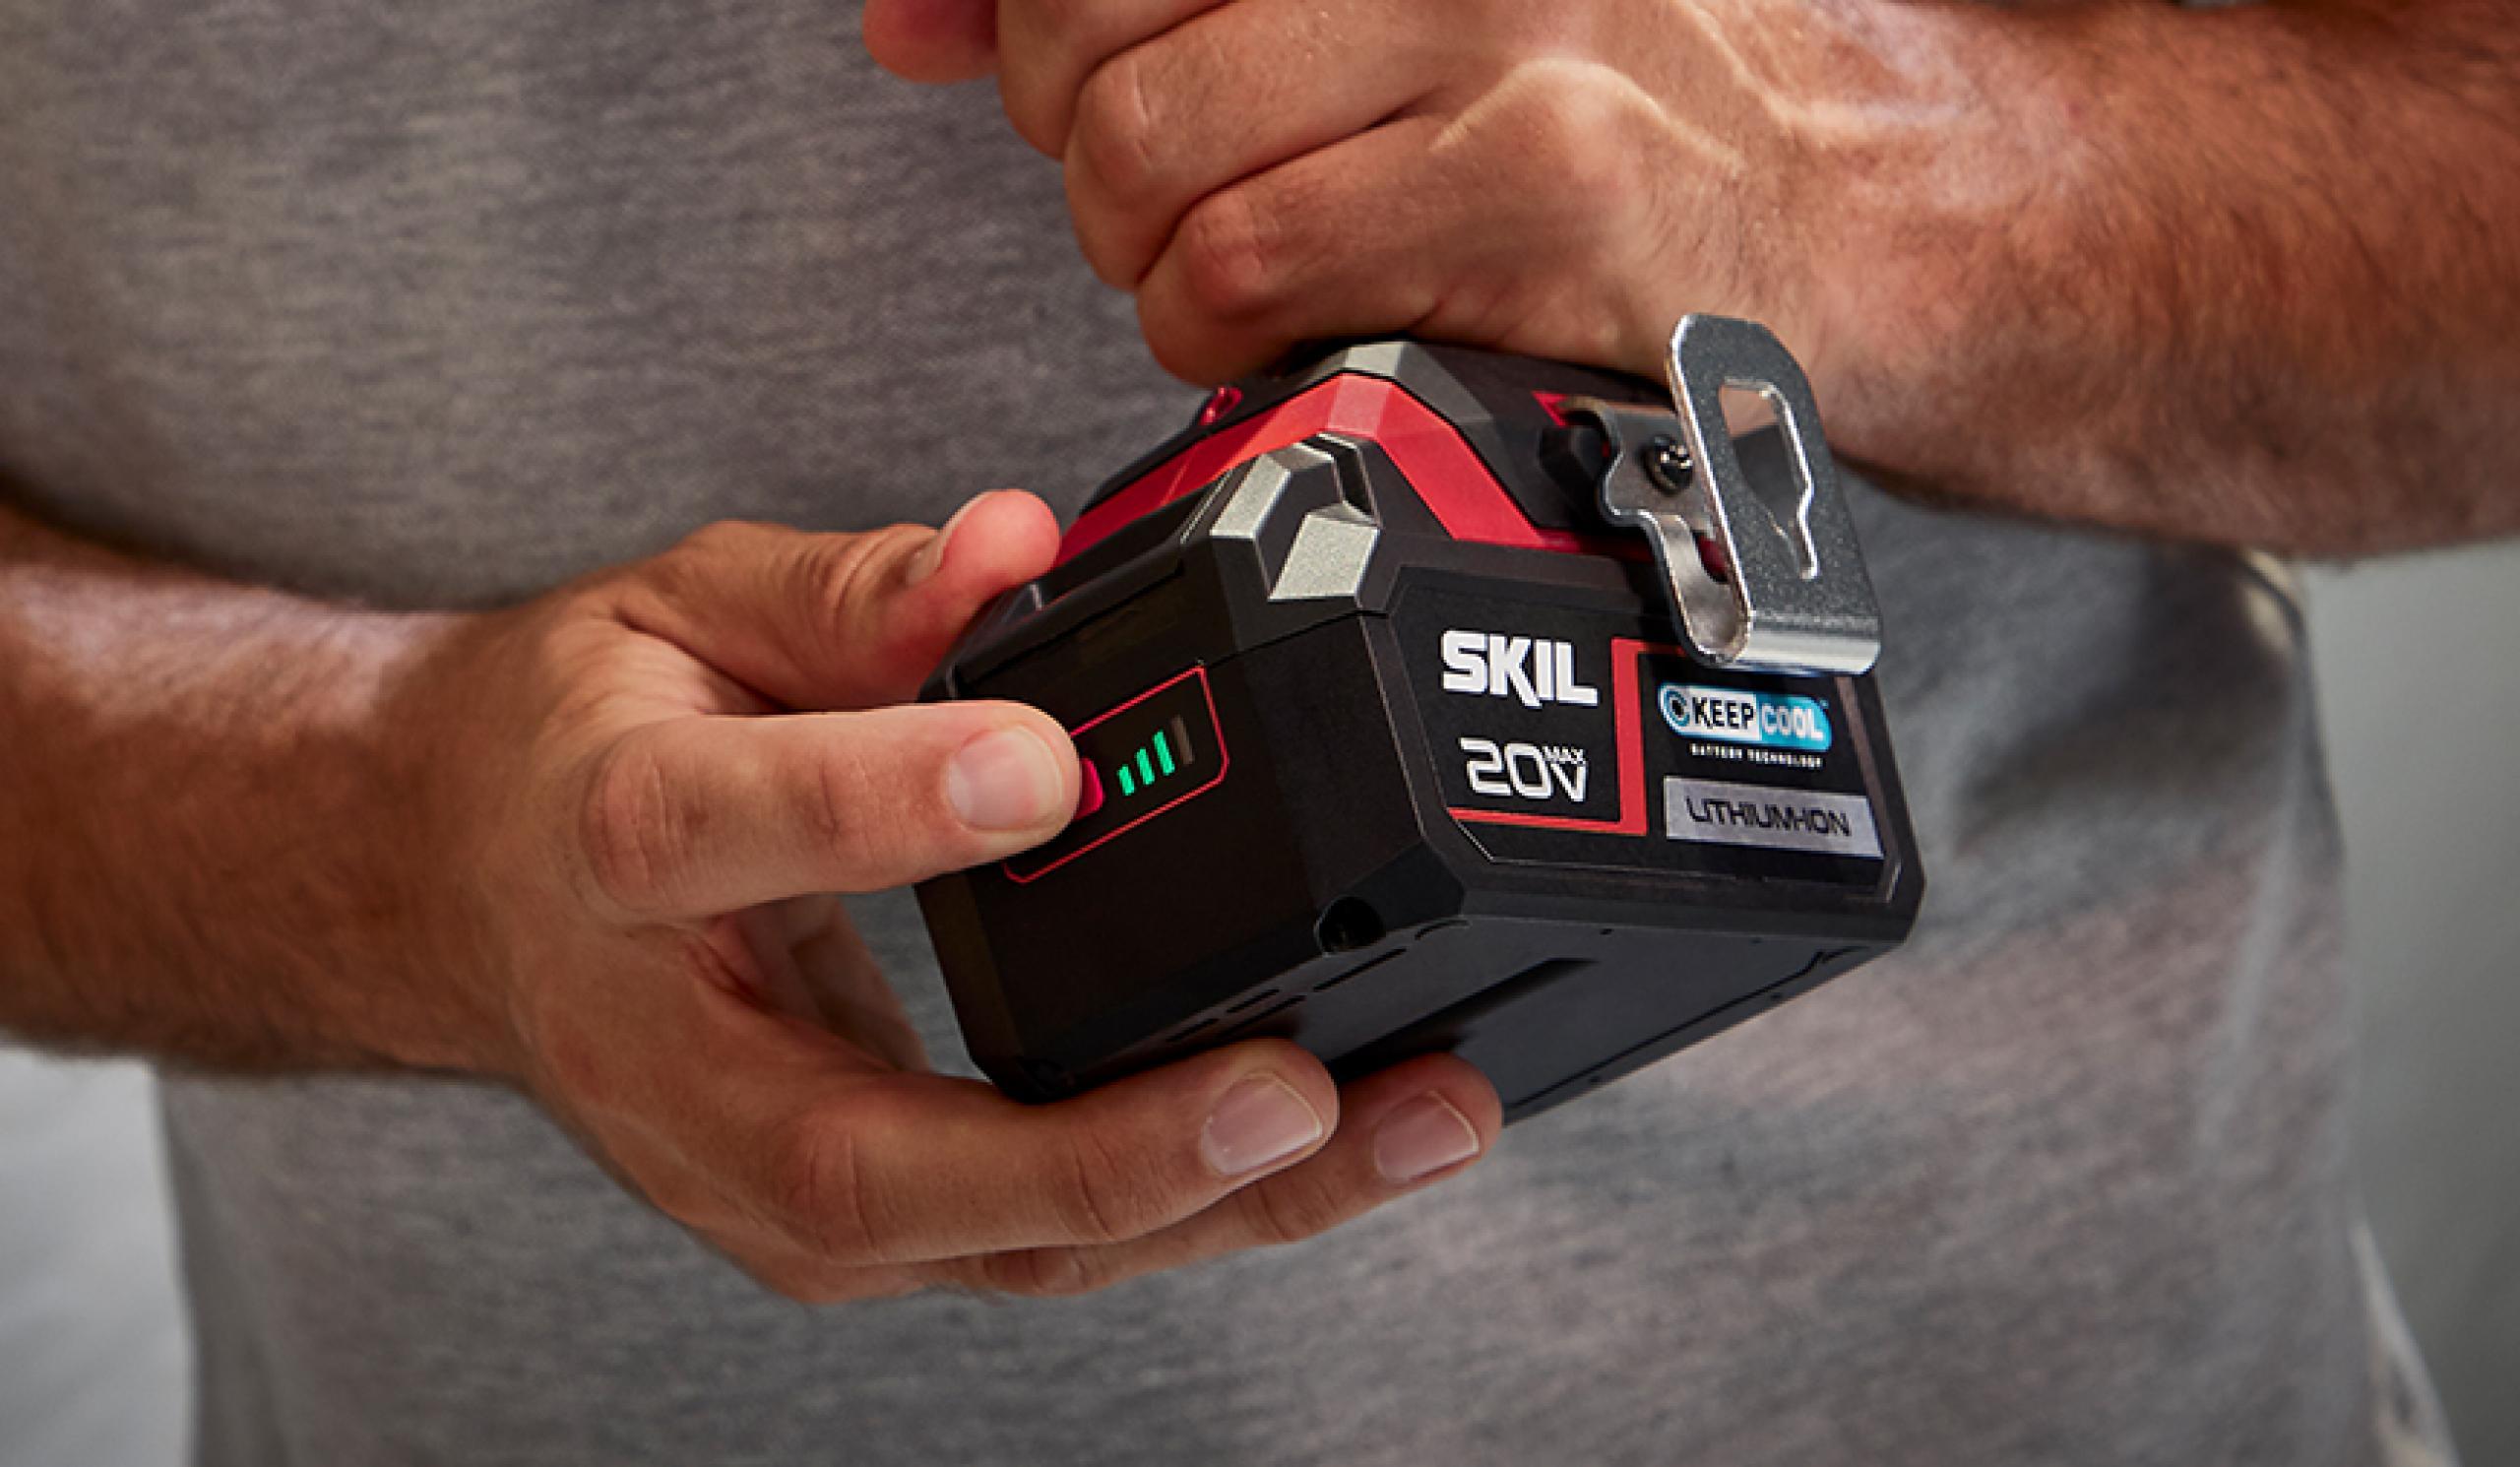 Patentert batterinivåindikator: indikatoren du kan stole på